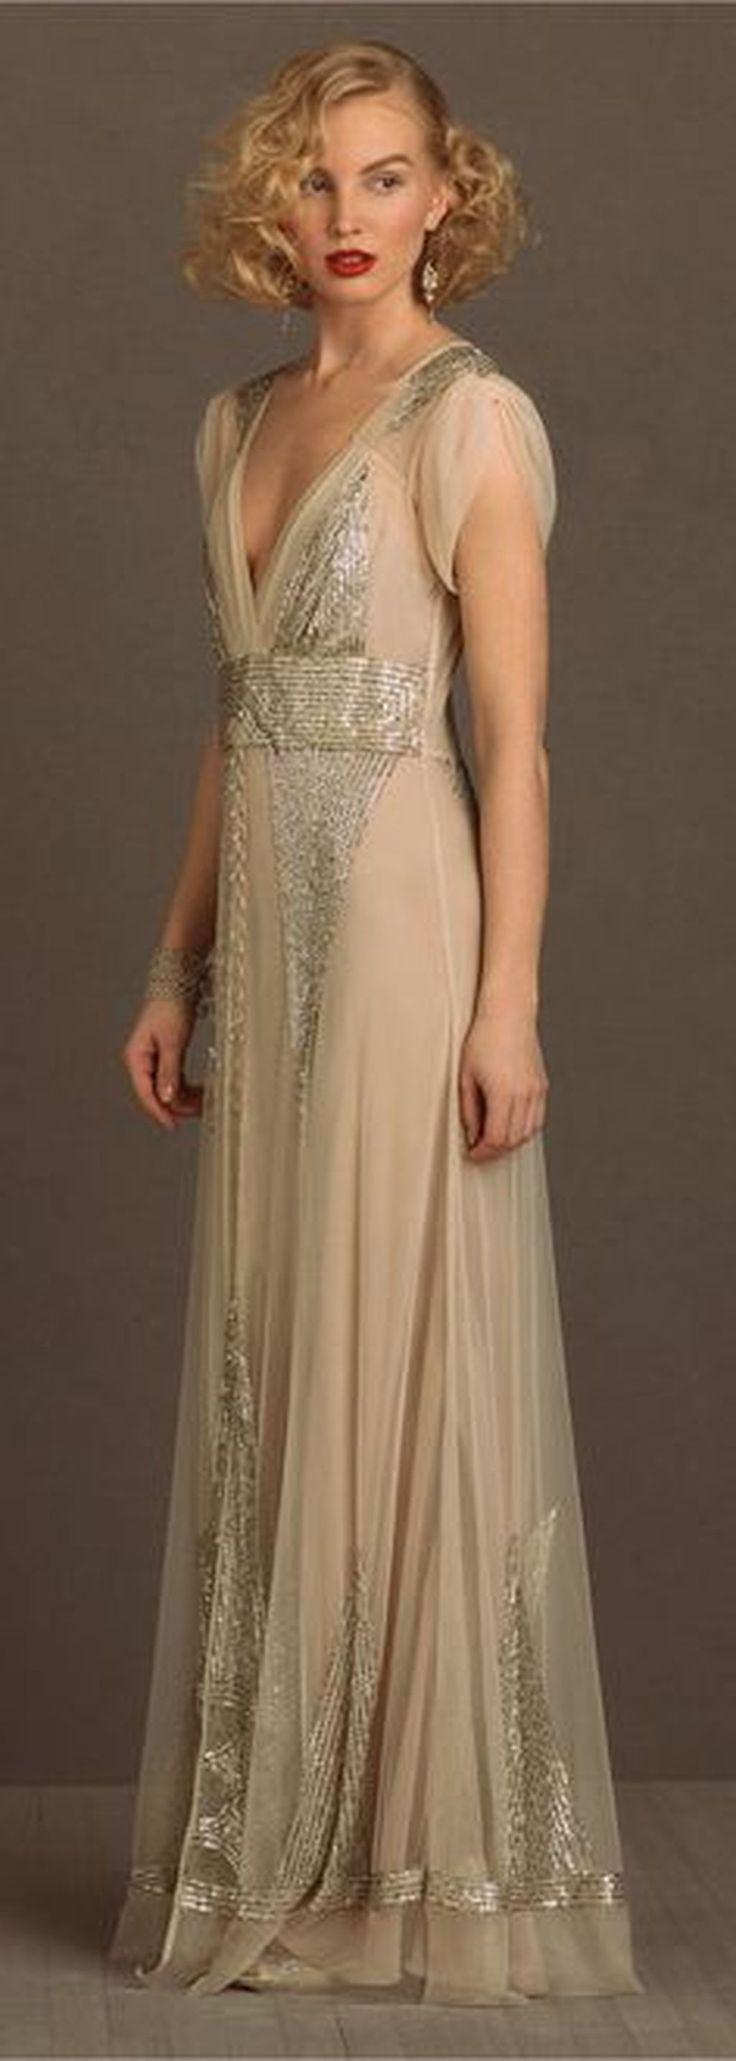 Trending  Best Vintage Princess Wedding Dress Ideas